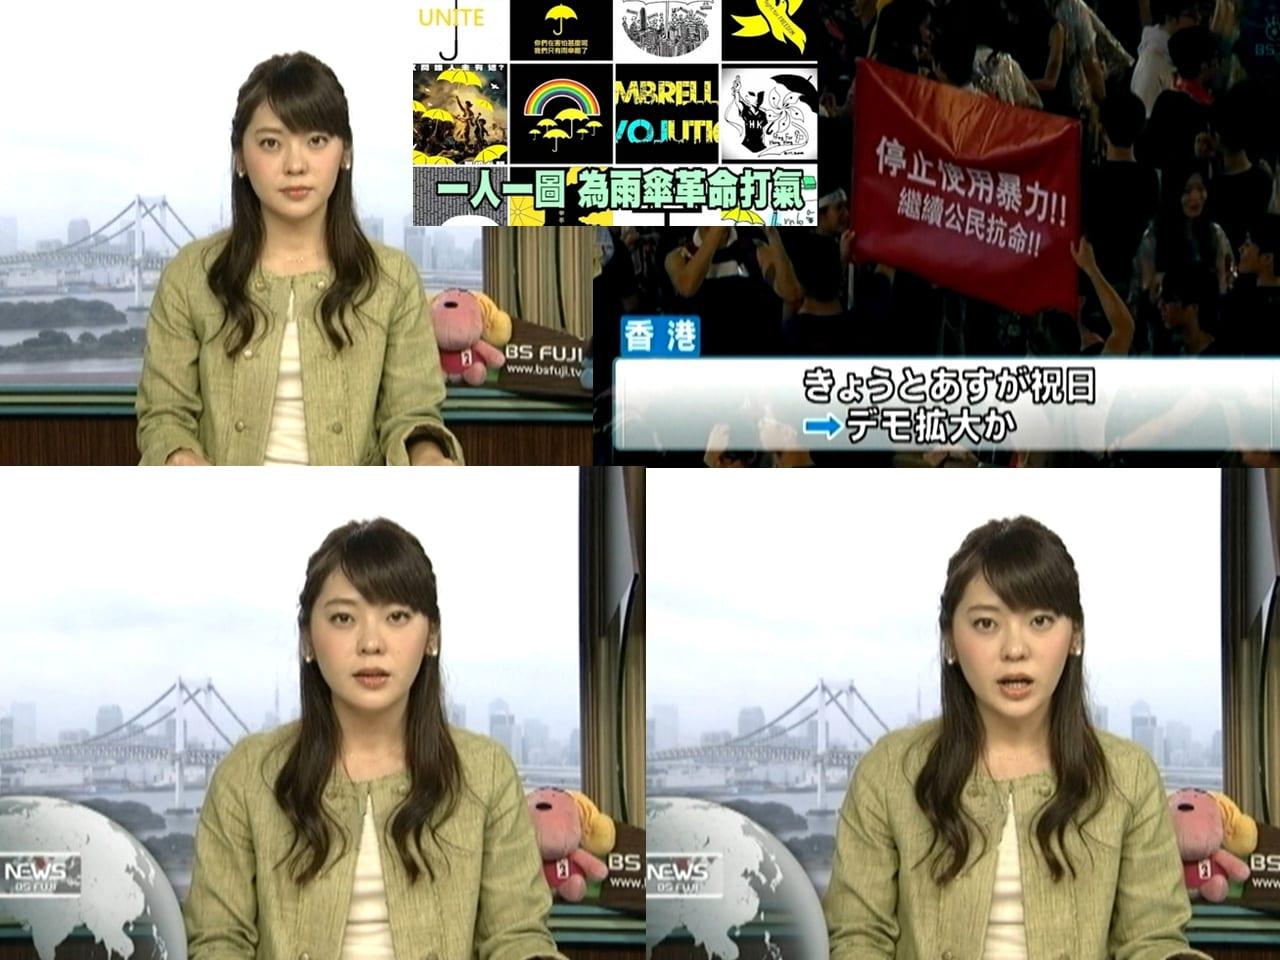 森夏美 (1995年生)の画像 p1_32